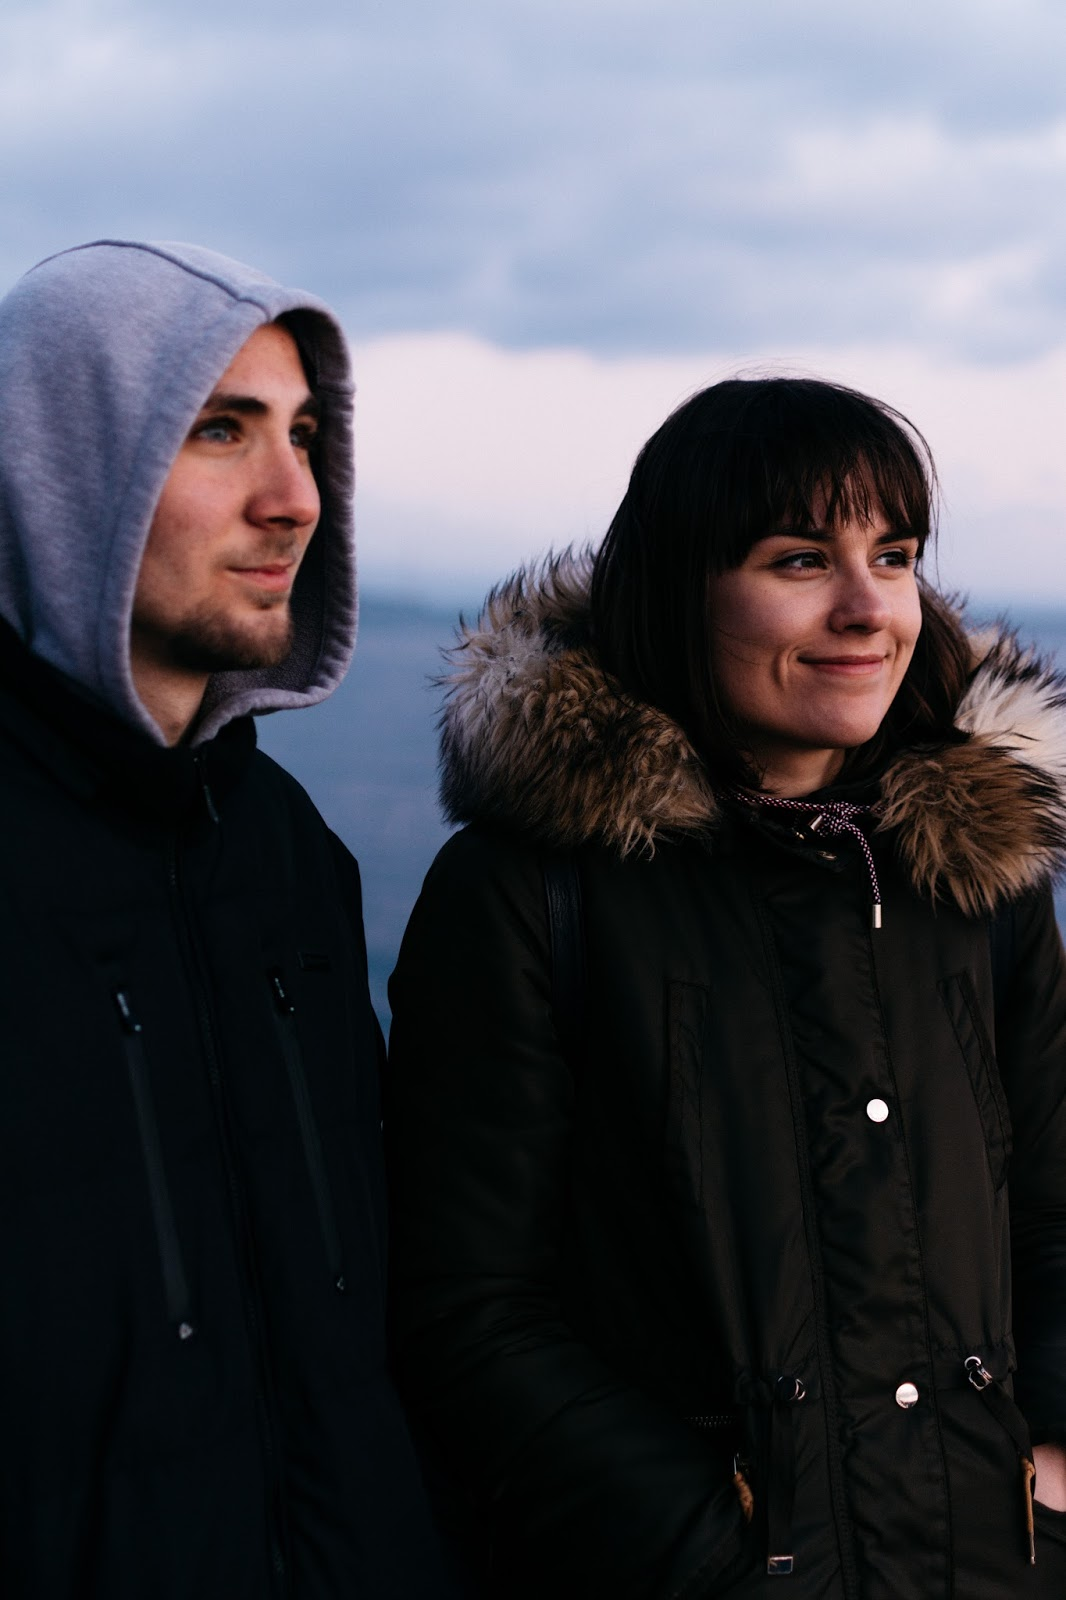 Mladen & Ana smile by Moonshinefaerie